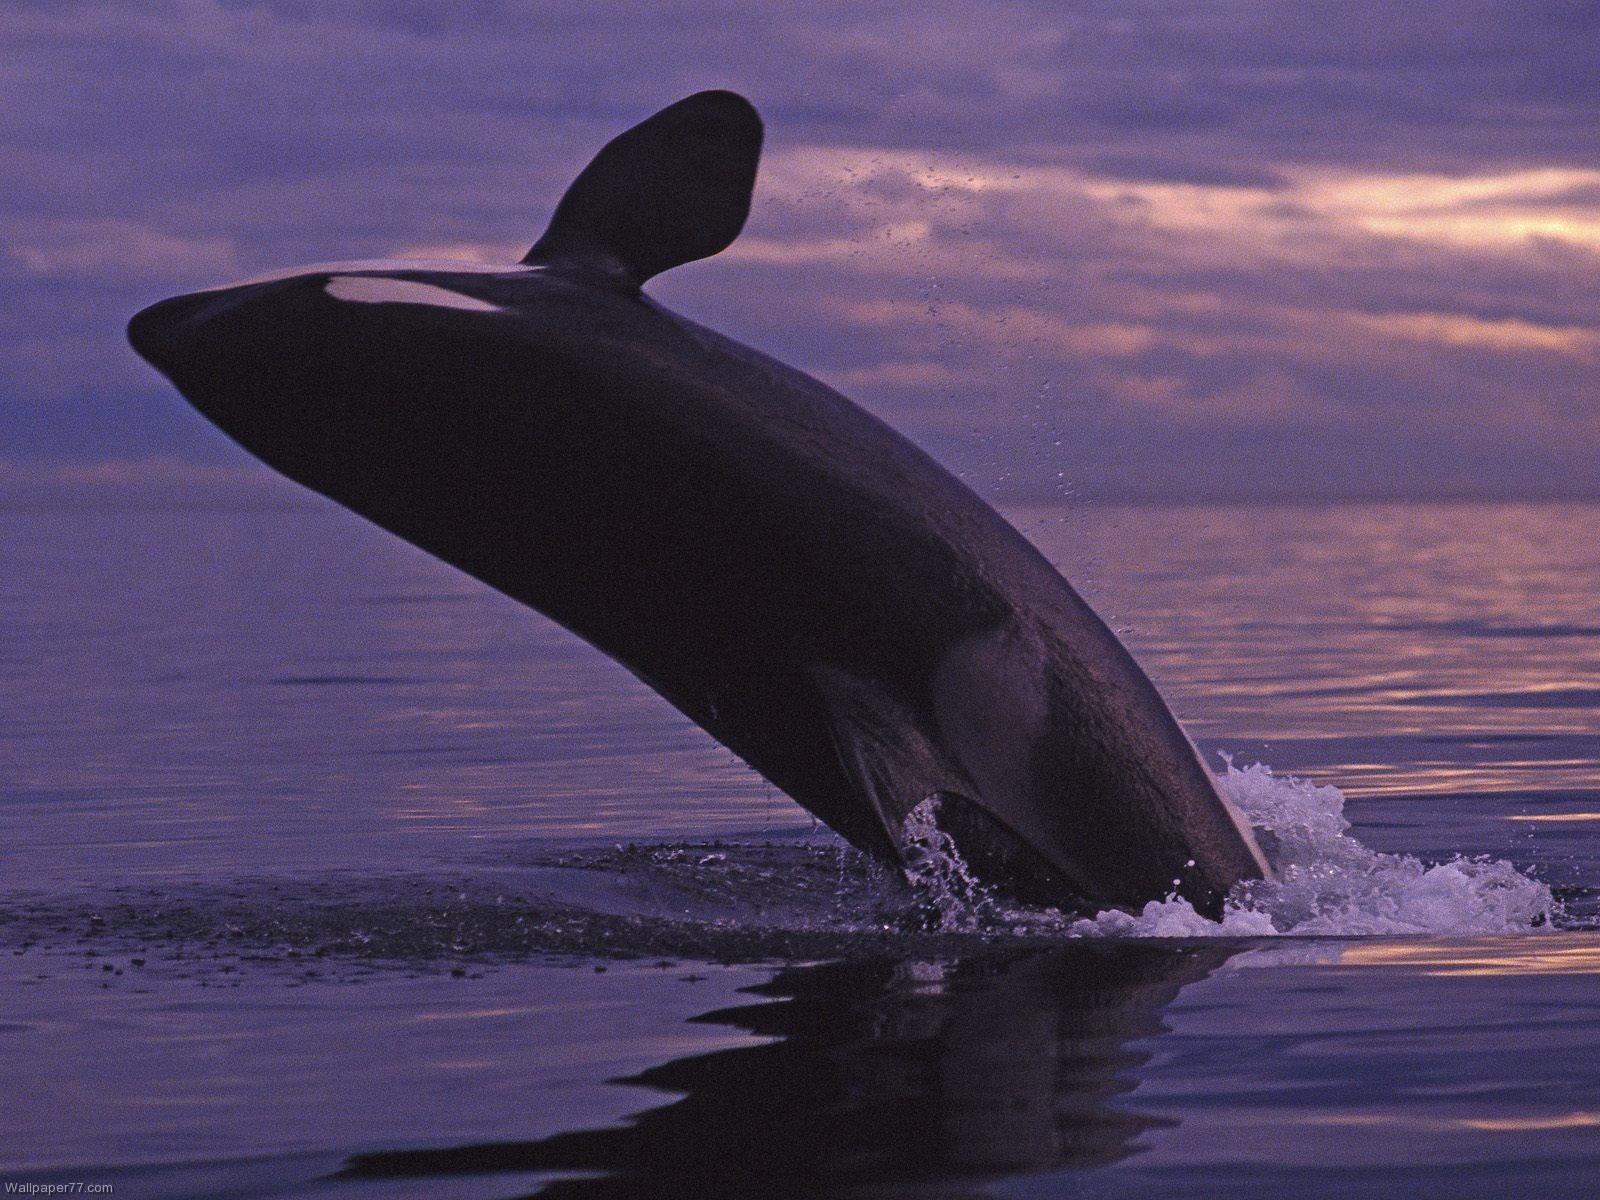 Killer Whale Jumping Mammal Wallpaper Ocean Se 10242 Wallpaper 1600x1200